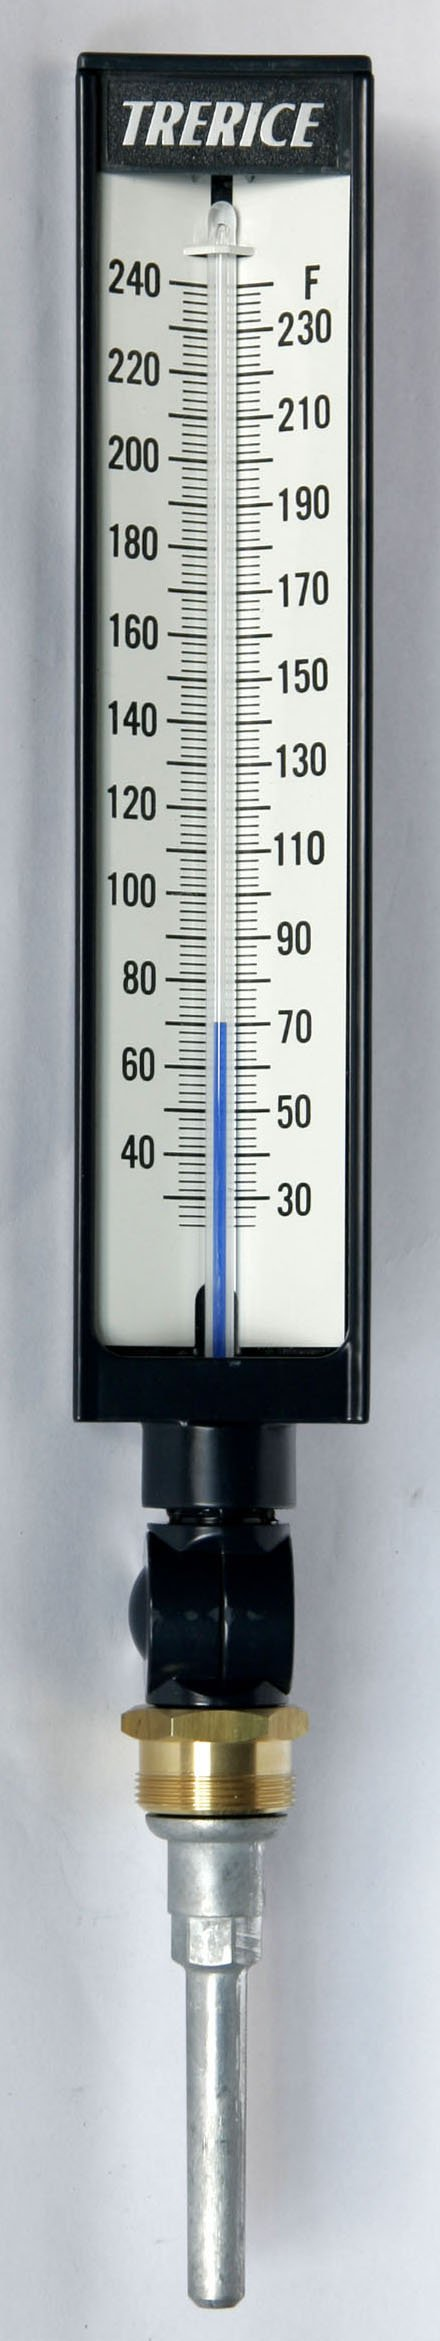 Trerice - BX Thermometer